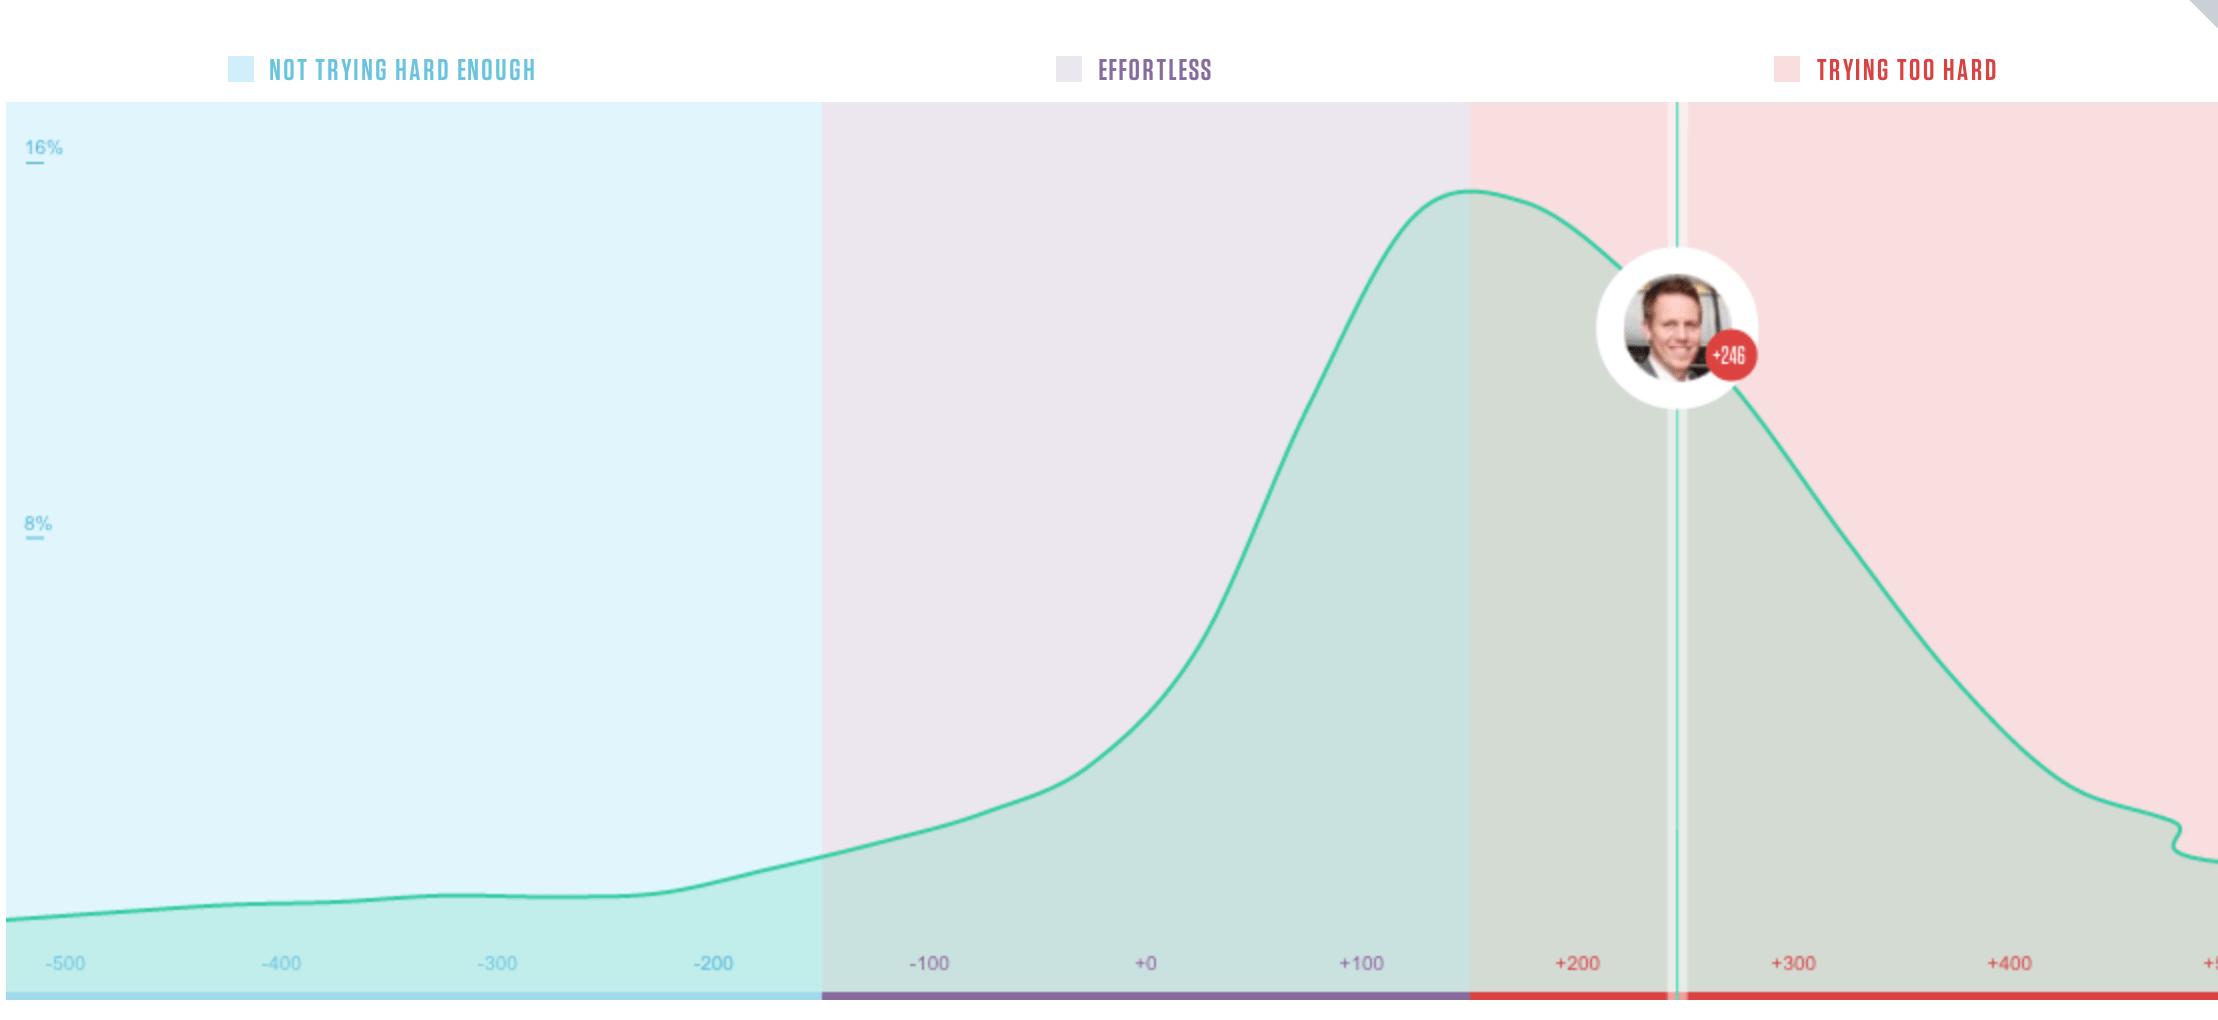 social-effort-scale-chart